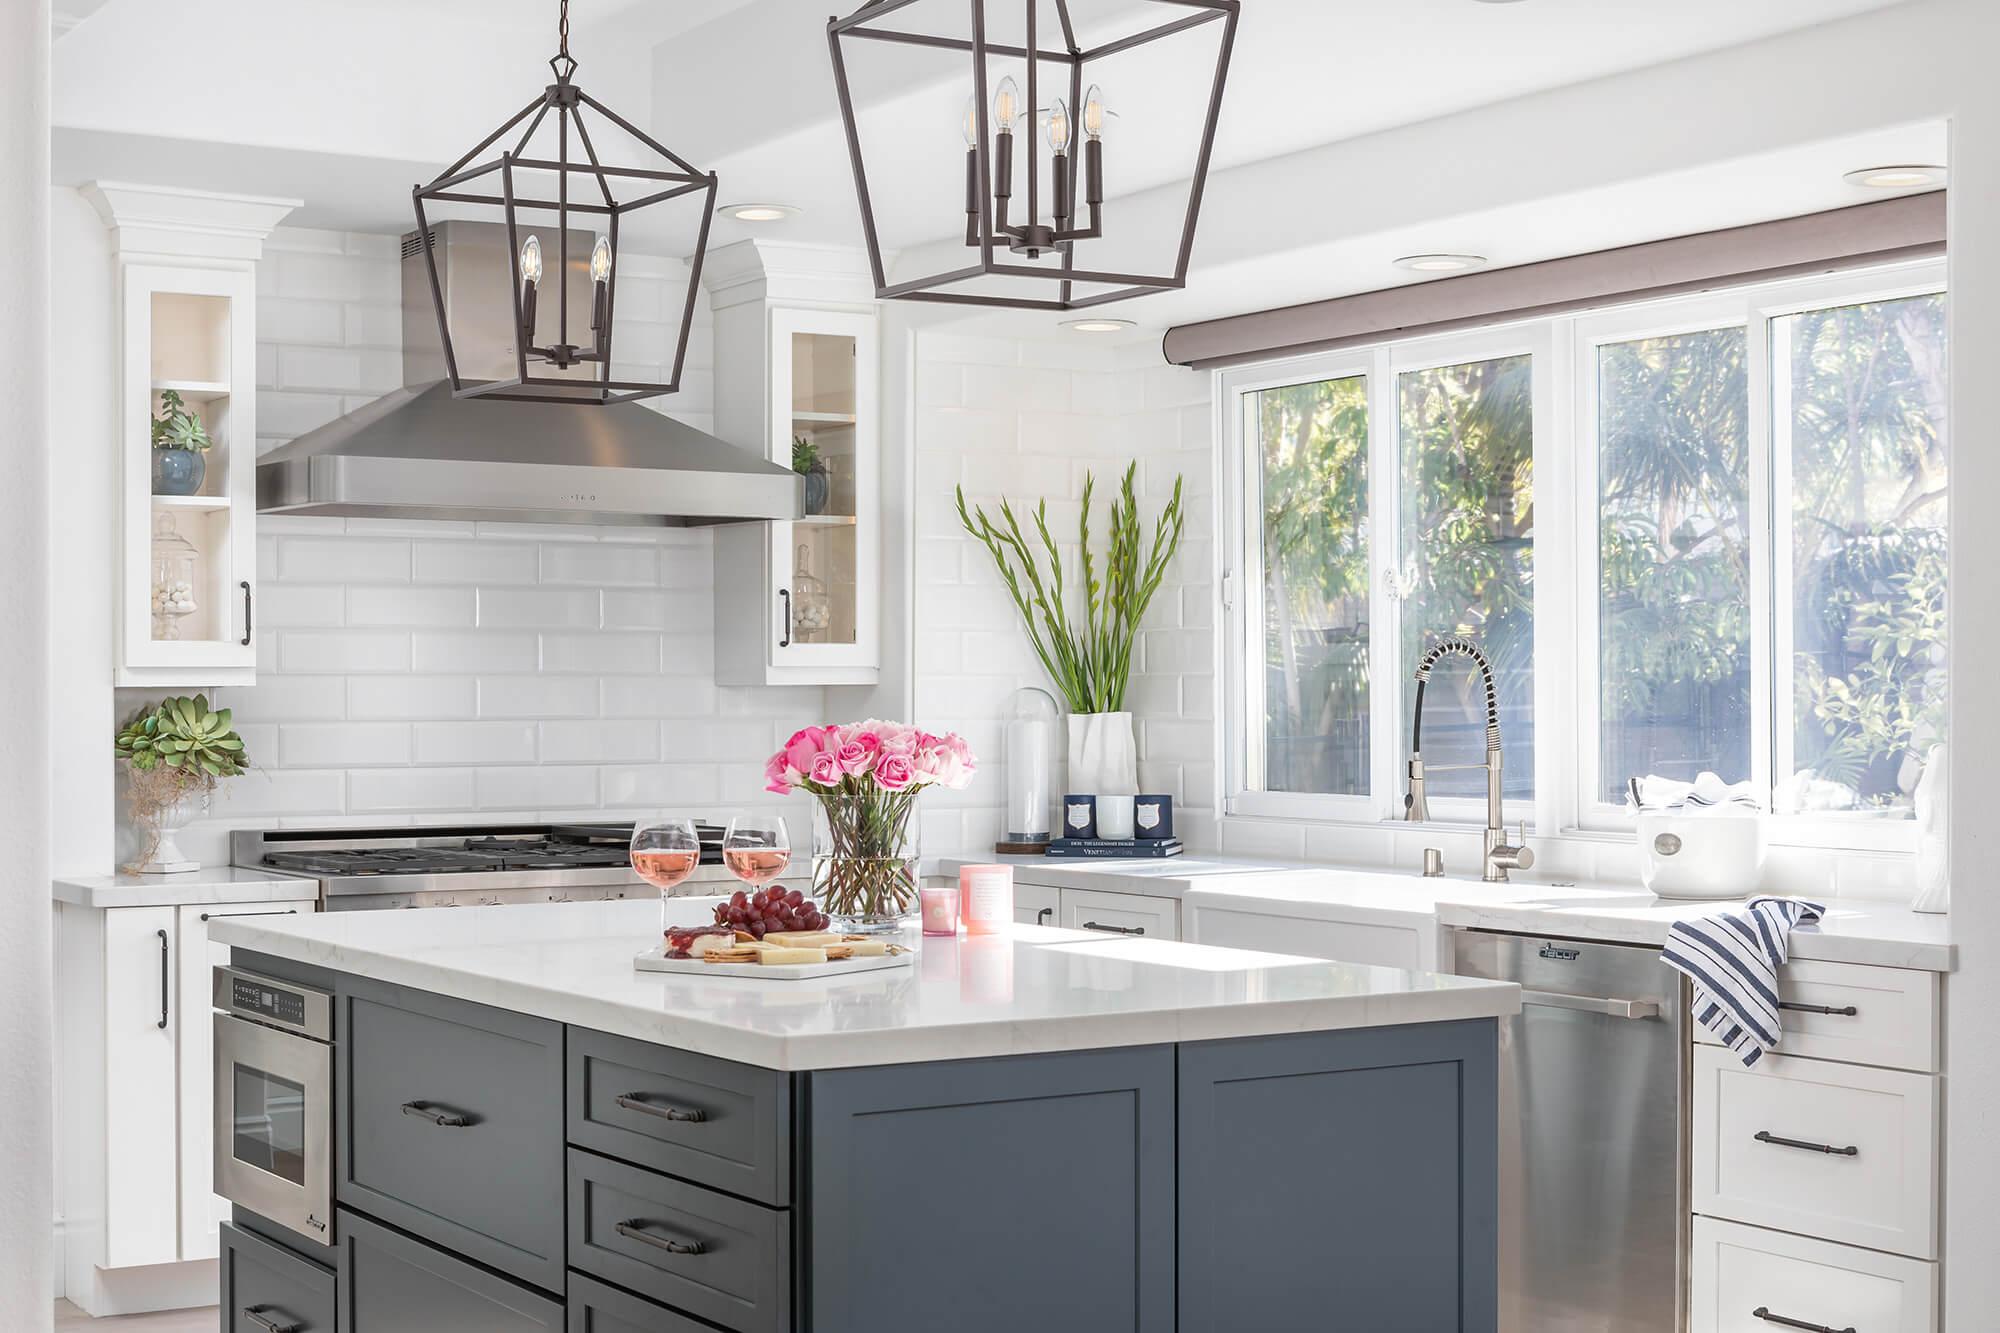 Kitchen Island Design Guide